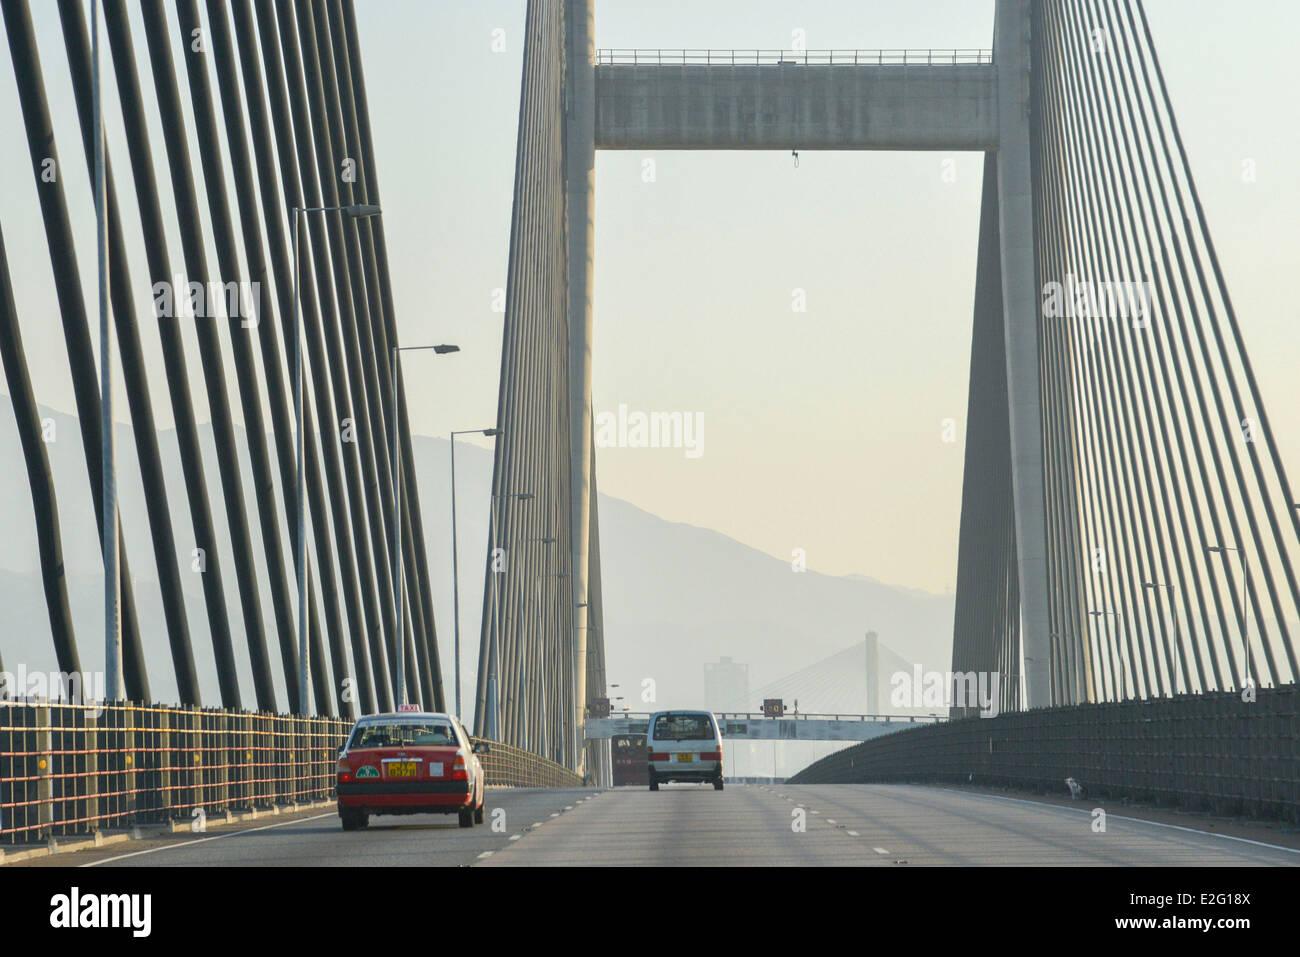 China Hong Kong Lantau Island red taxi on a highway exceeding the suspension bridge of Tsing Ma - Stock Image